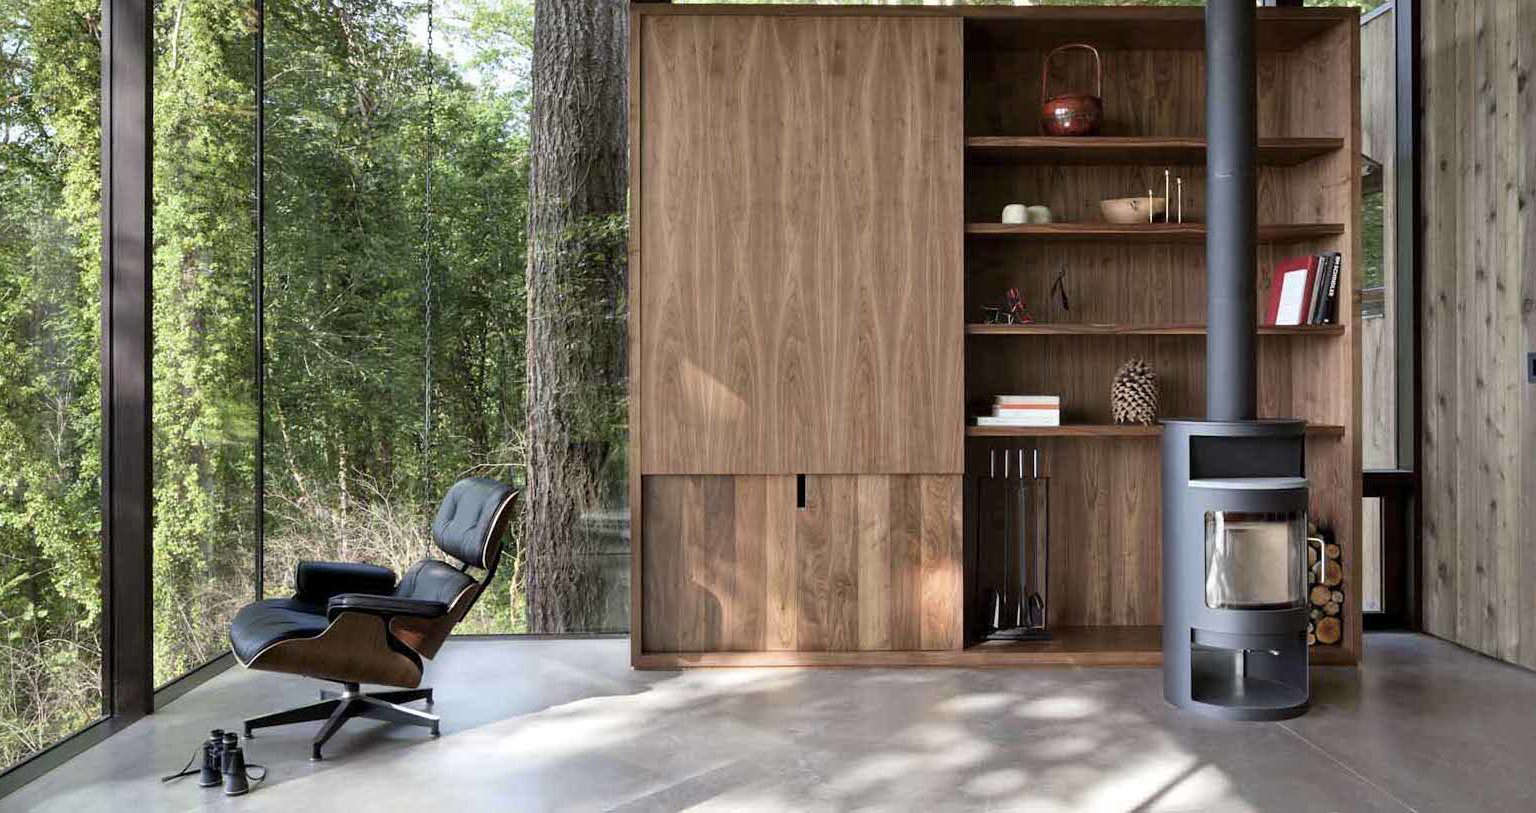 A Puget Sound Cabin That Rests Lightly on the Landscape